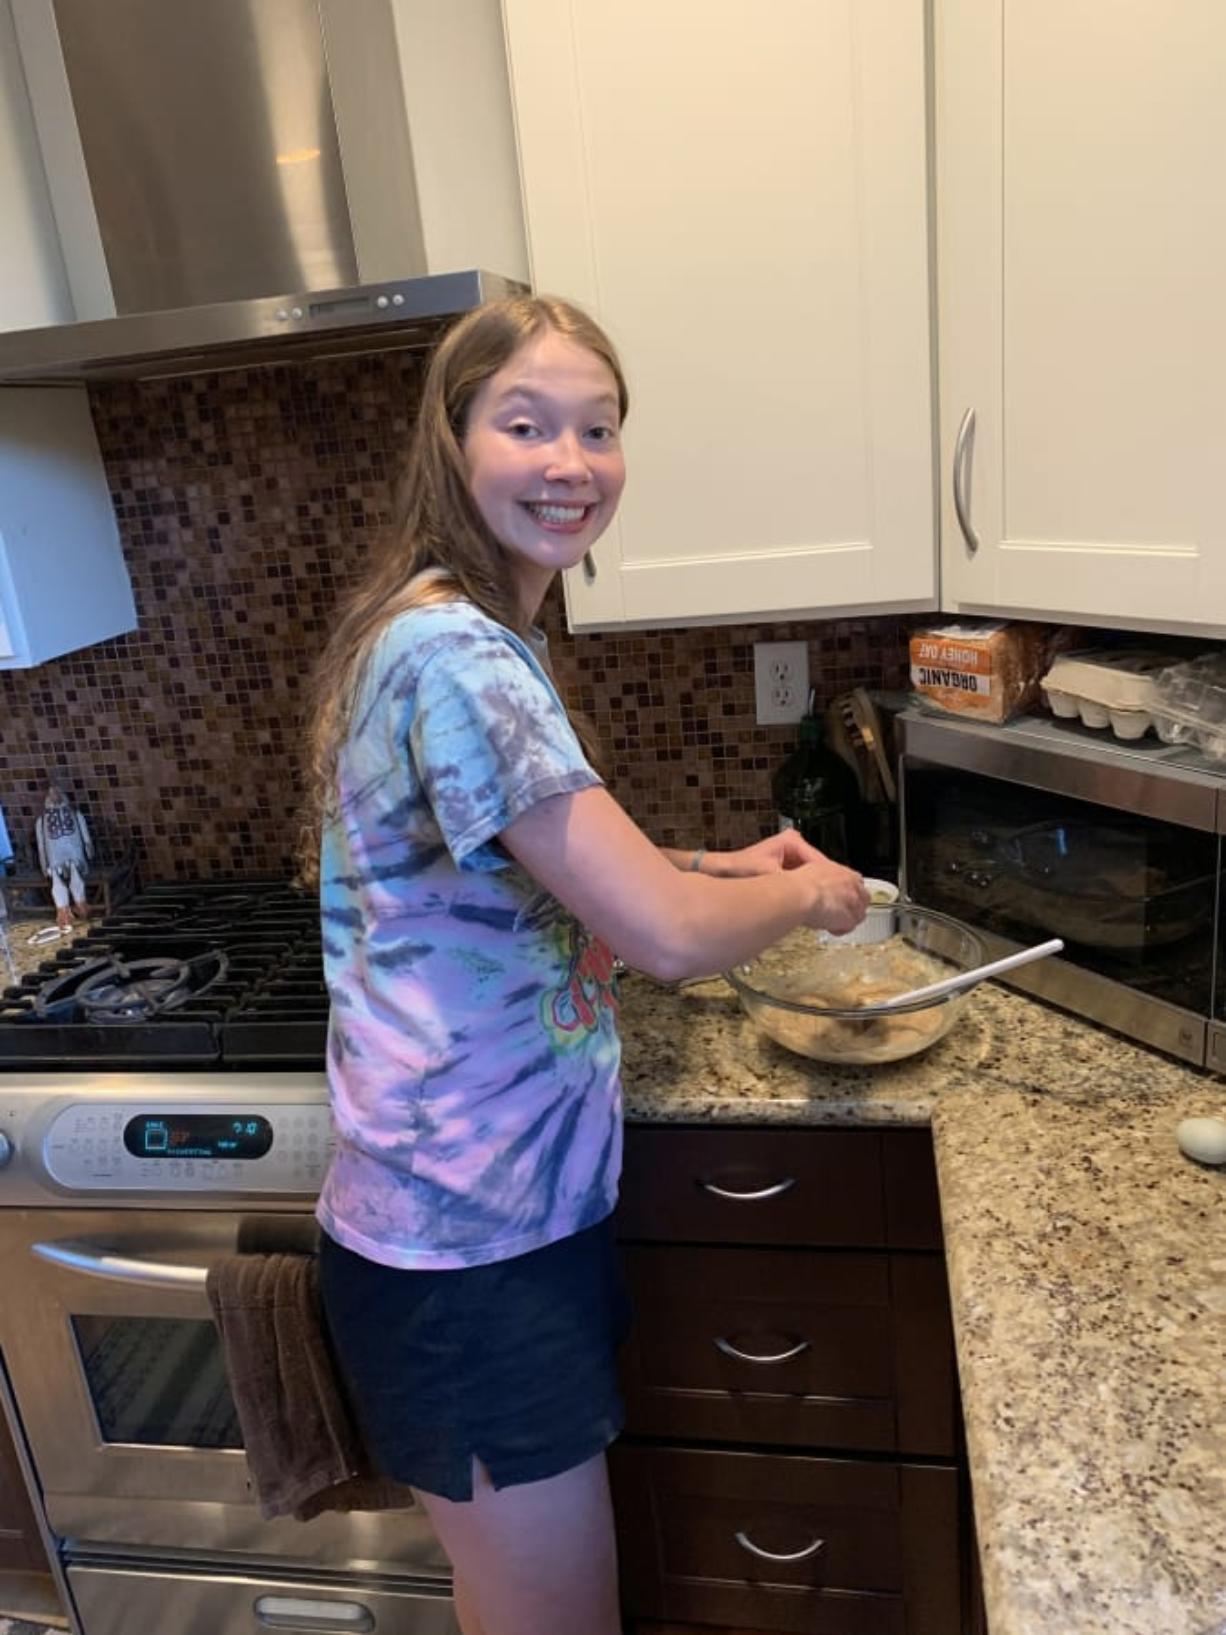 Washougal High School student Samantha Mederos learns culinary arts remotely.